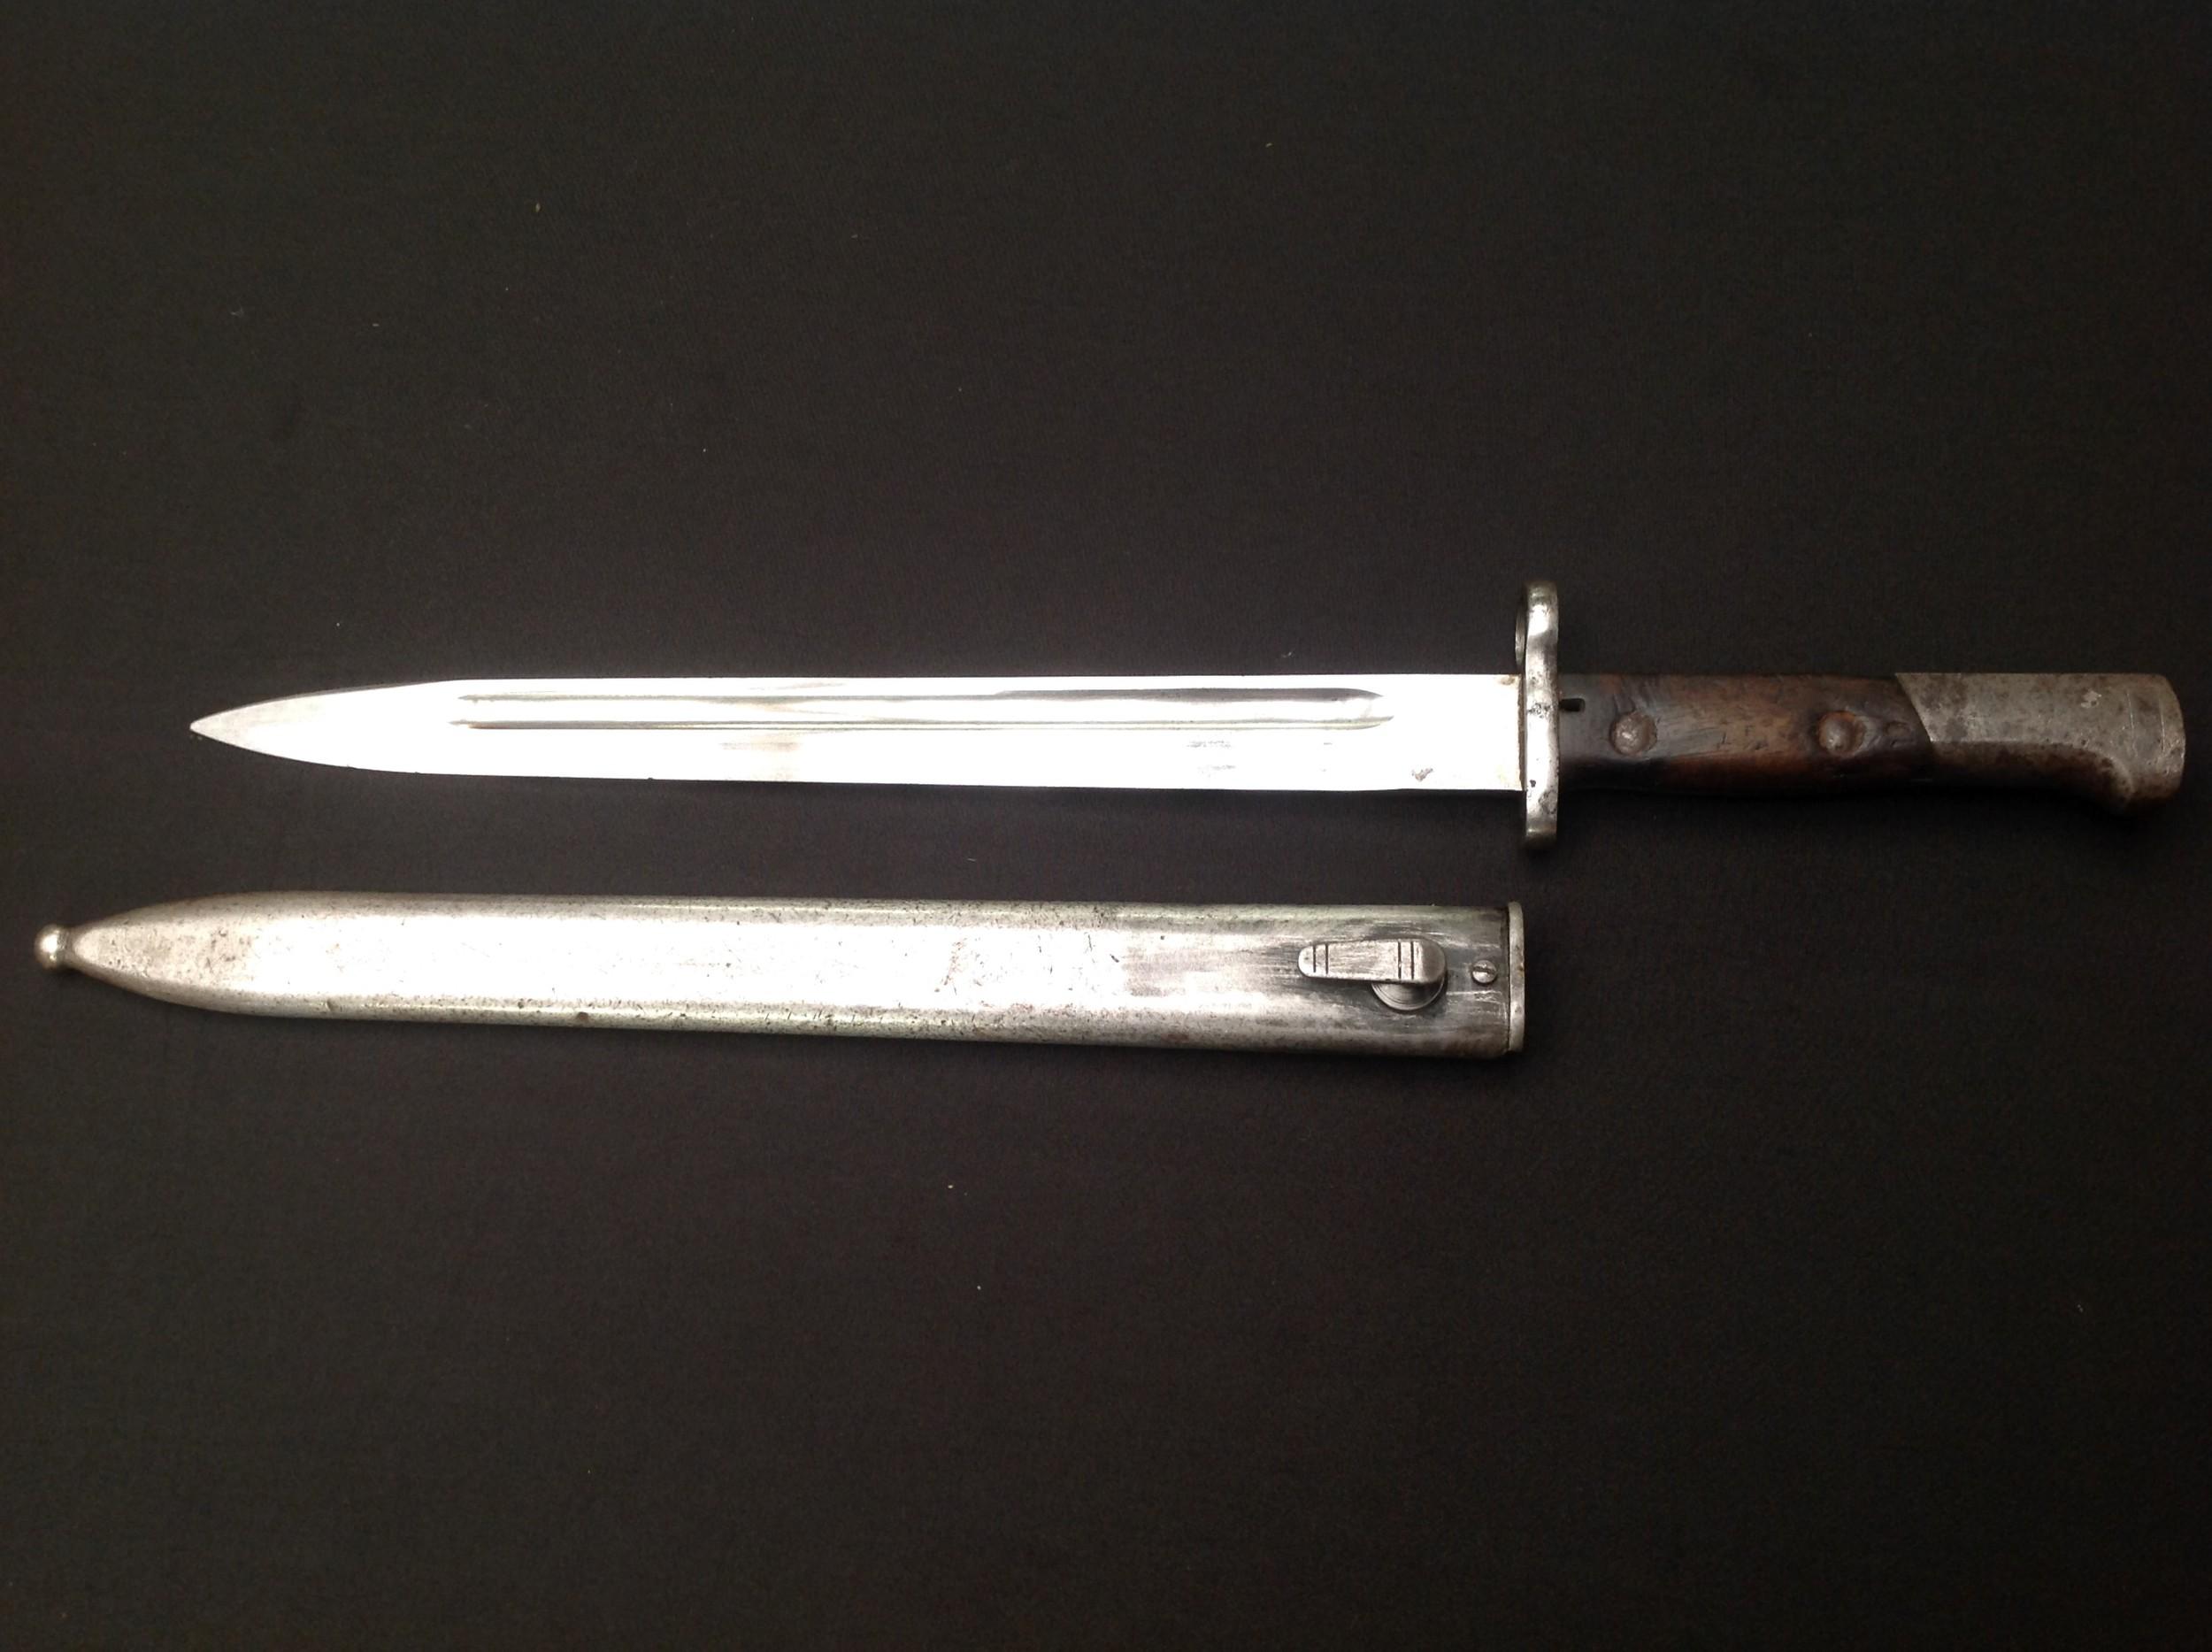 British 1888 pattern Lee-Metford bayonet by Wilkinson, London, 30.5cm blade marked 3 02, two-piece - Image 3 of 18